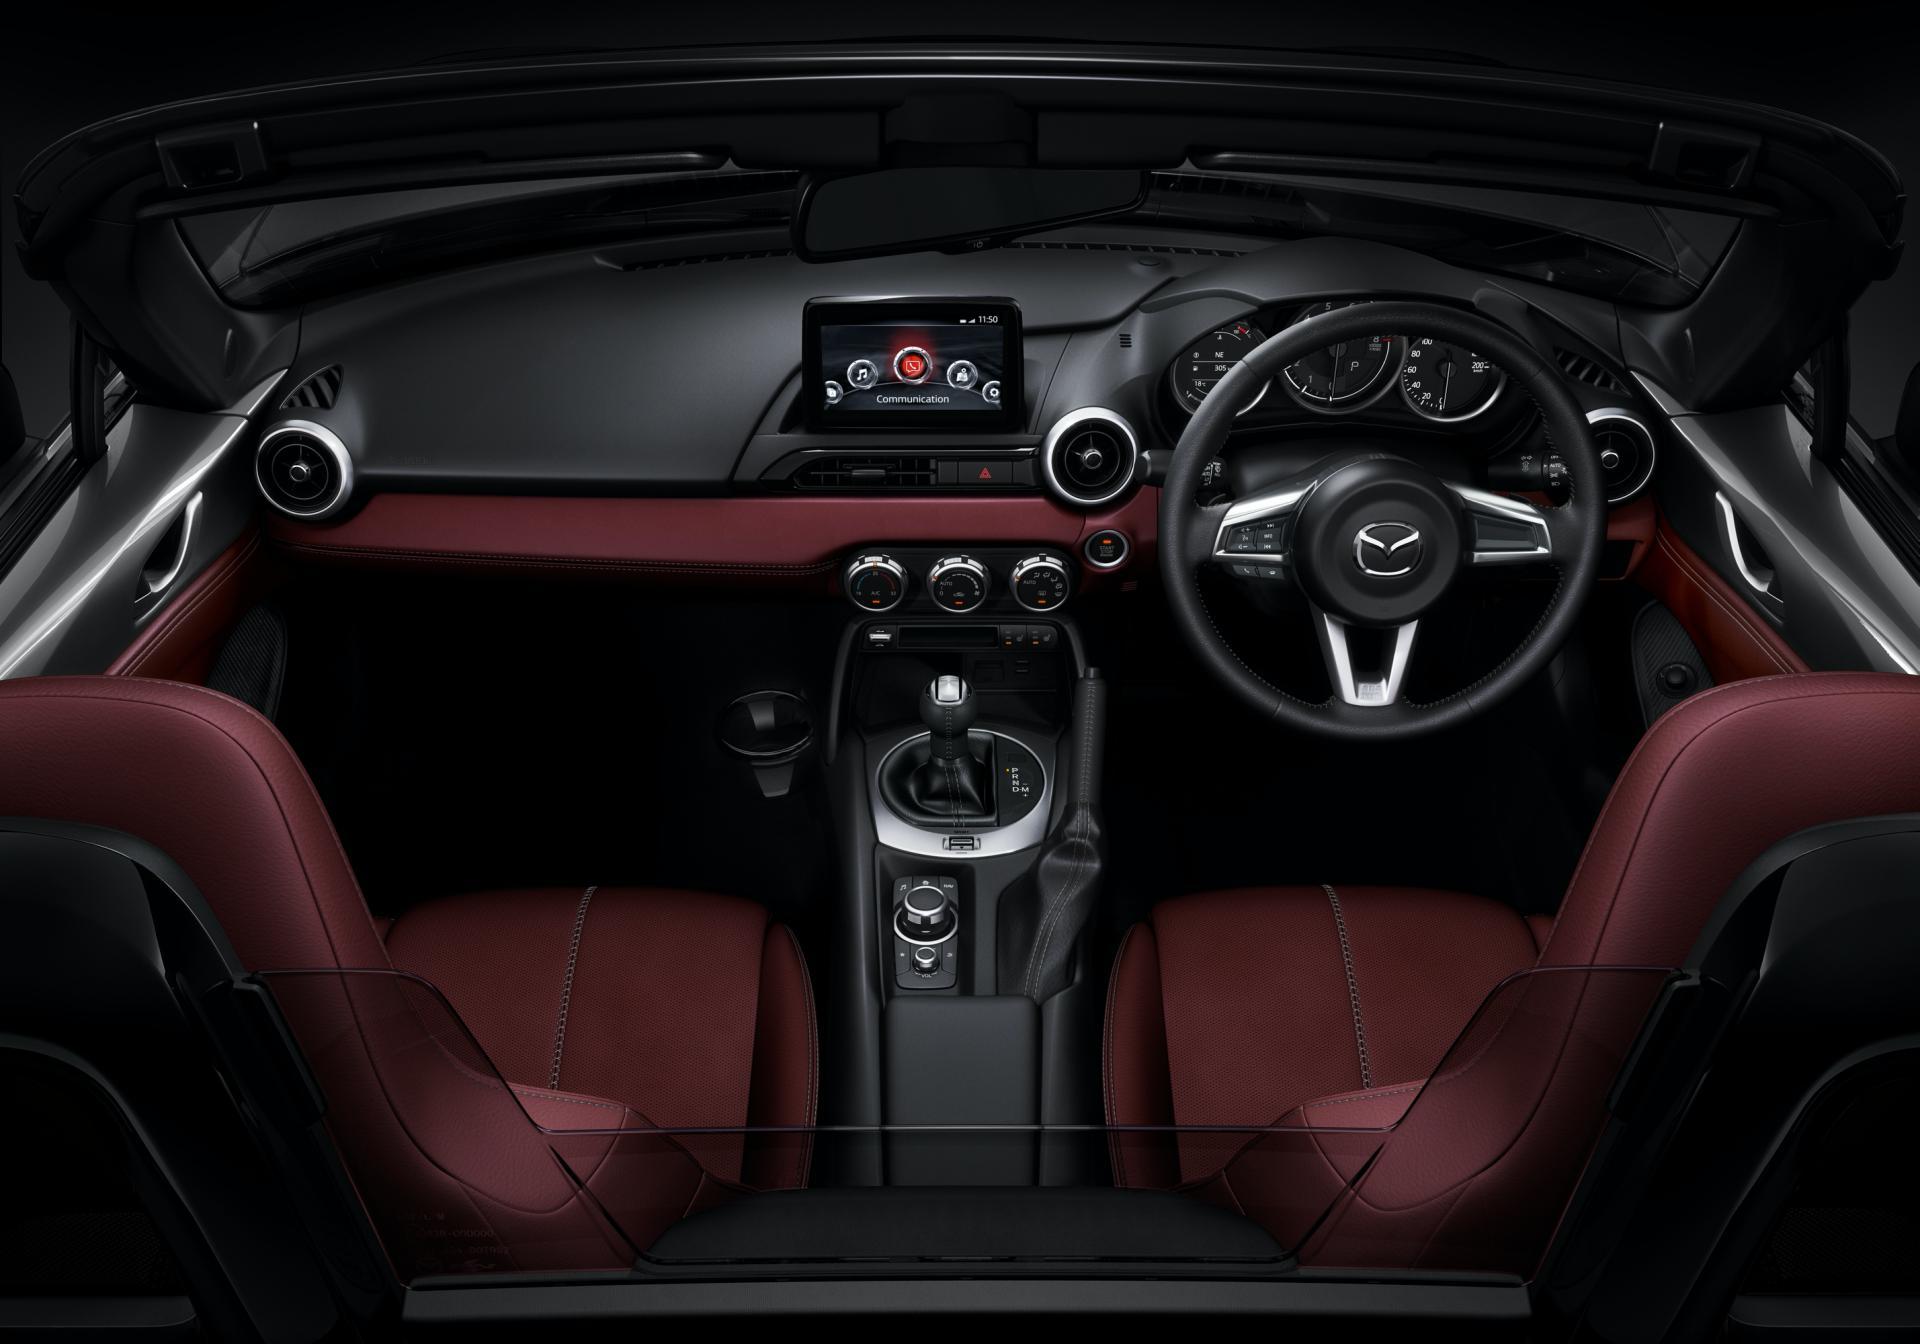 Mazda-MX-5-and-CX-5-2020-10